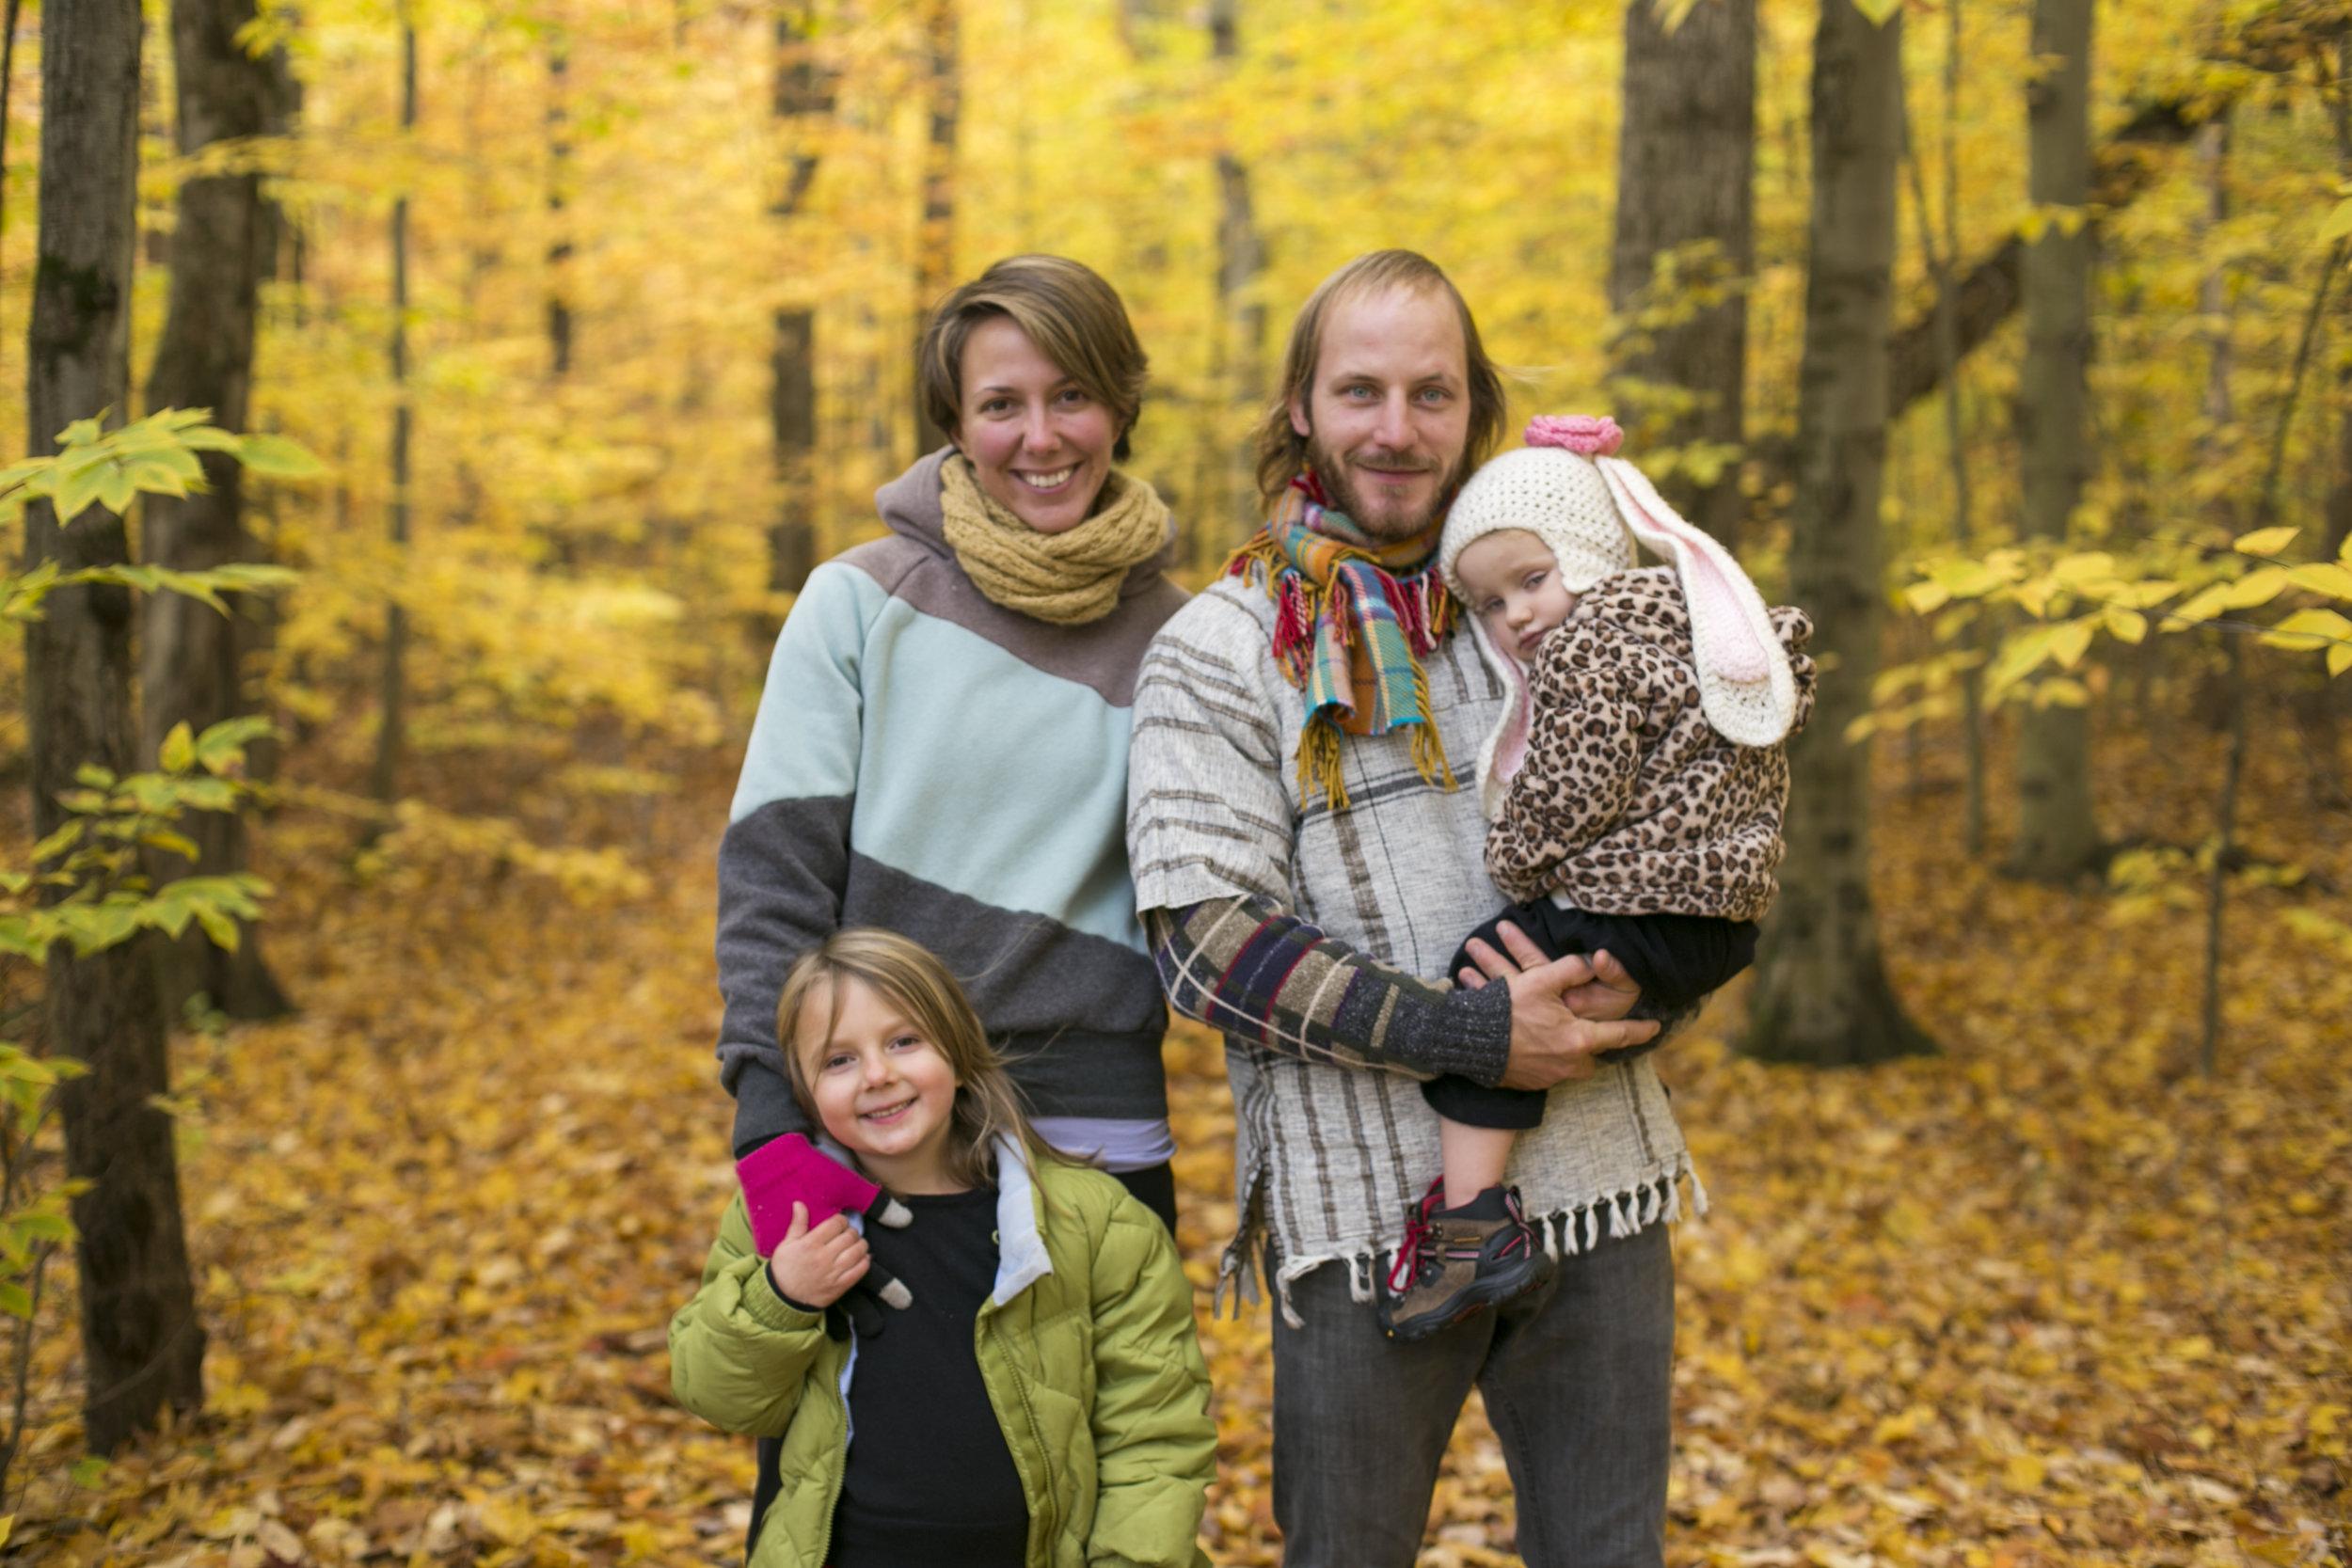 adorable family-4.jpg